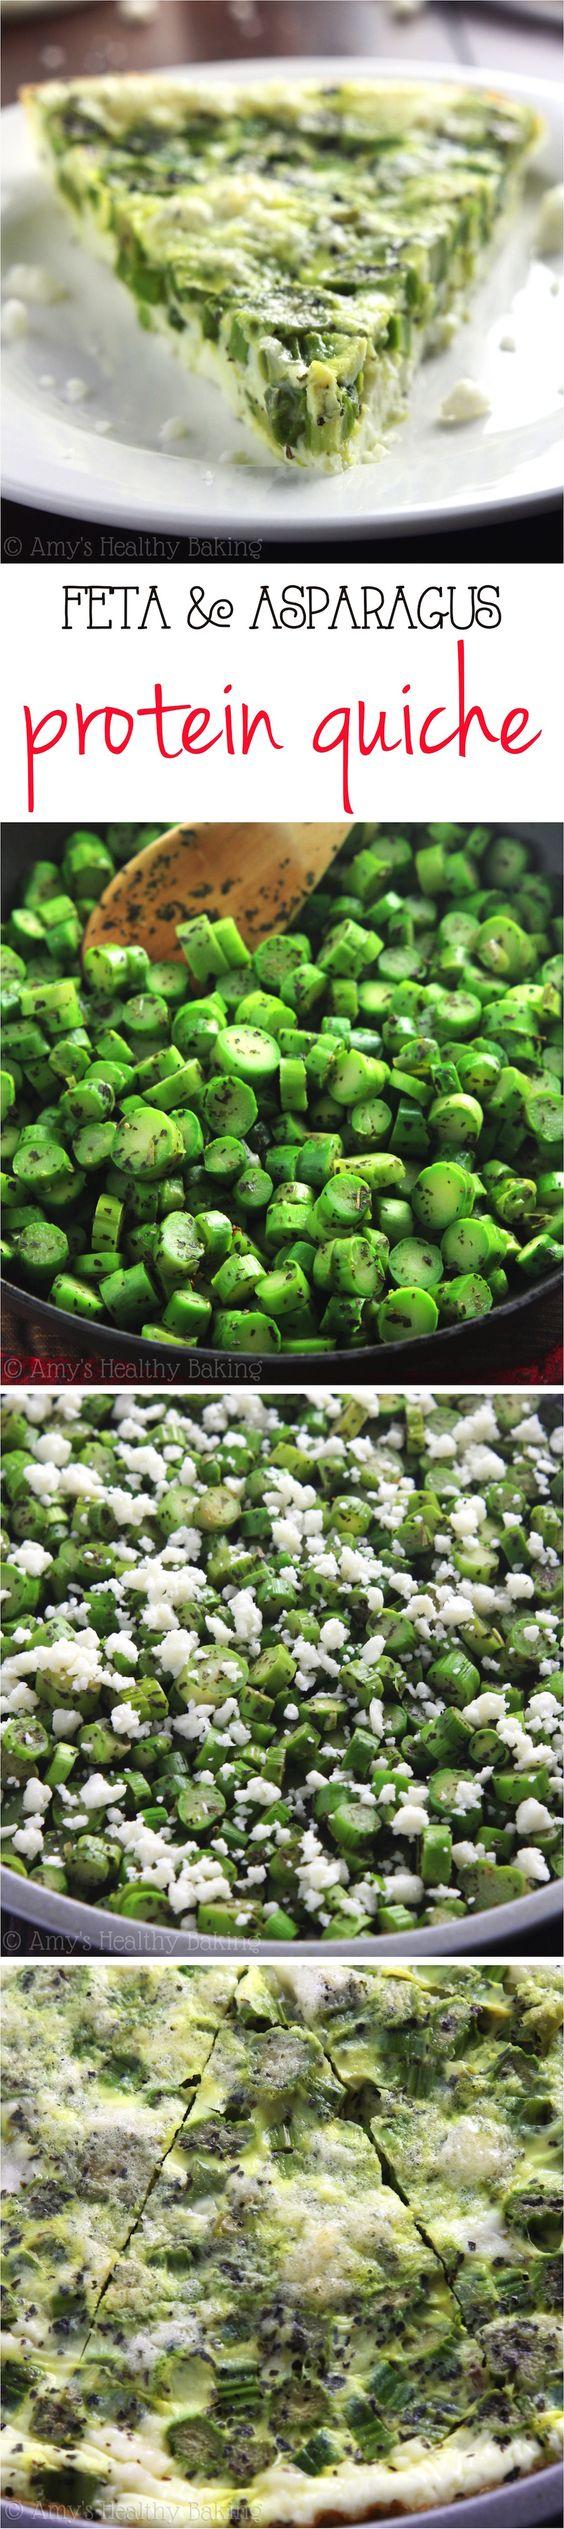 Skinny Asparagus & Feta Quiche | Recipe | Quiche, Asparagus and Feta